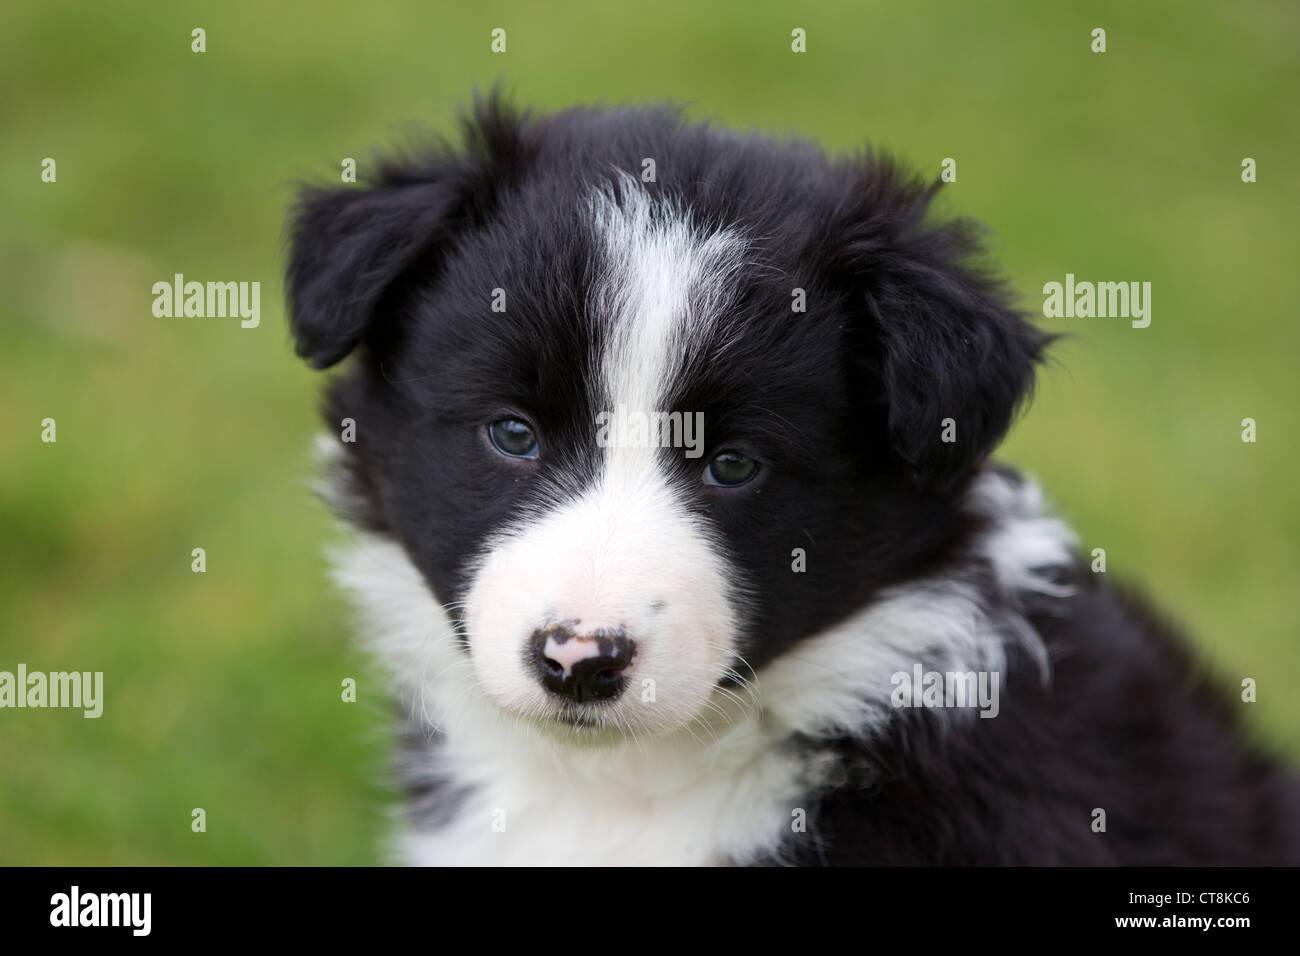 black white puppy stock photos black white puppy stock images